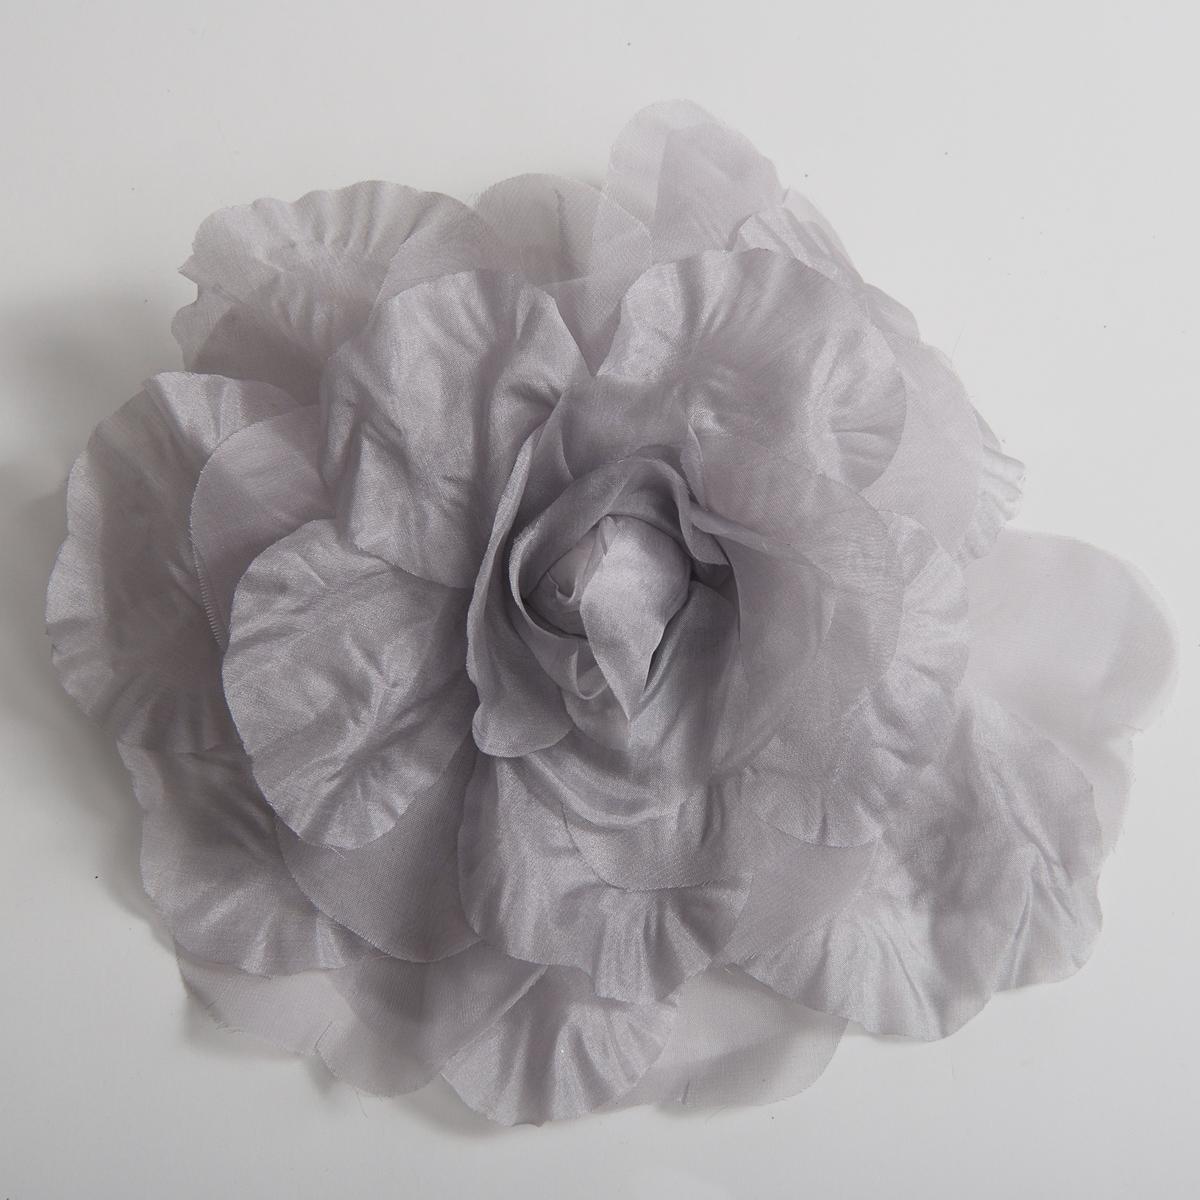 Silver silk open rose flower heads 802053 sv sun yorkos zoria silver open rose silk flower trims mightylinksfo